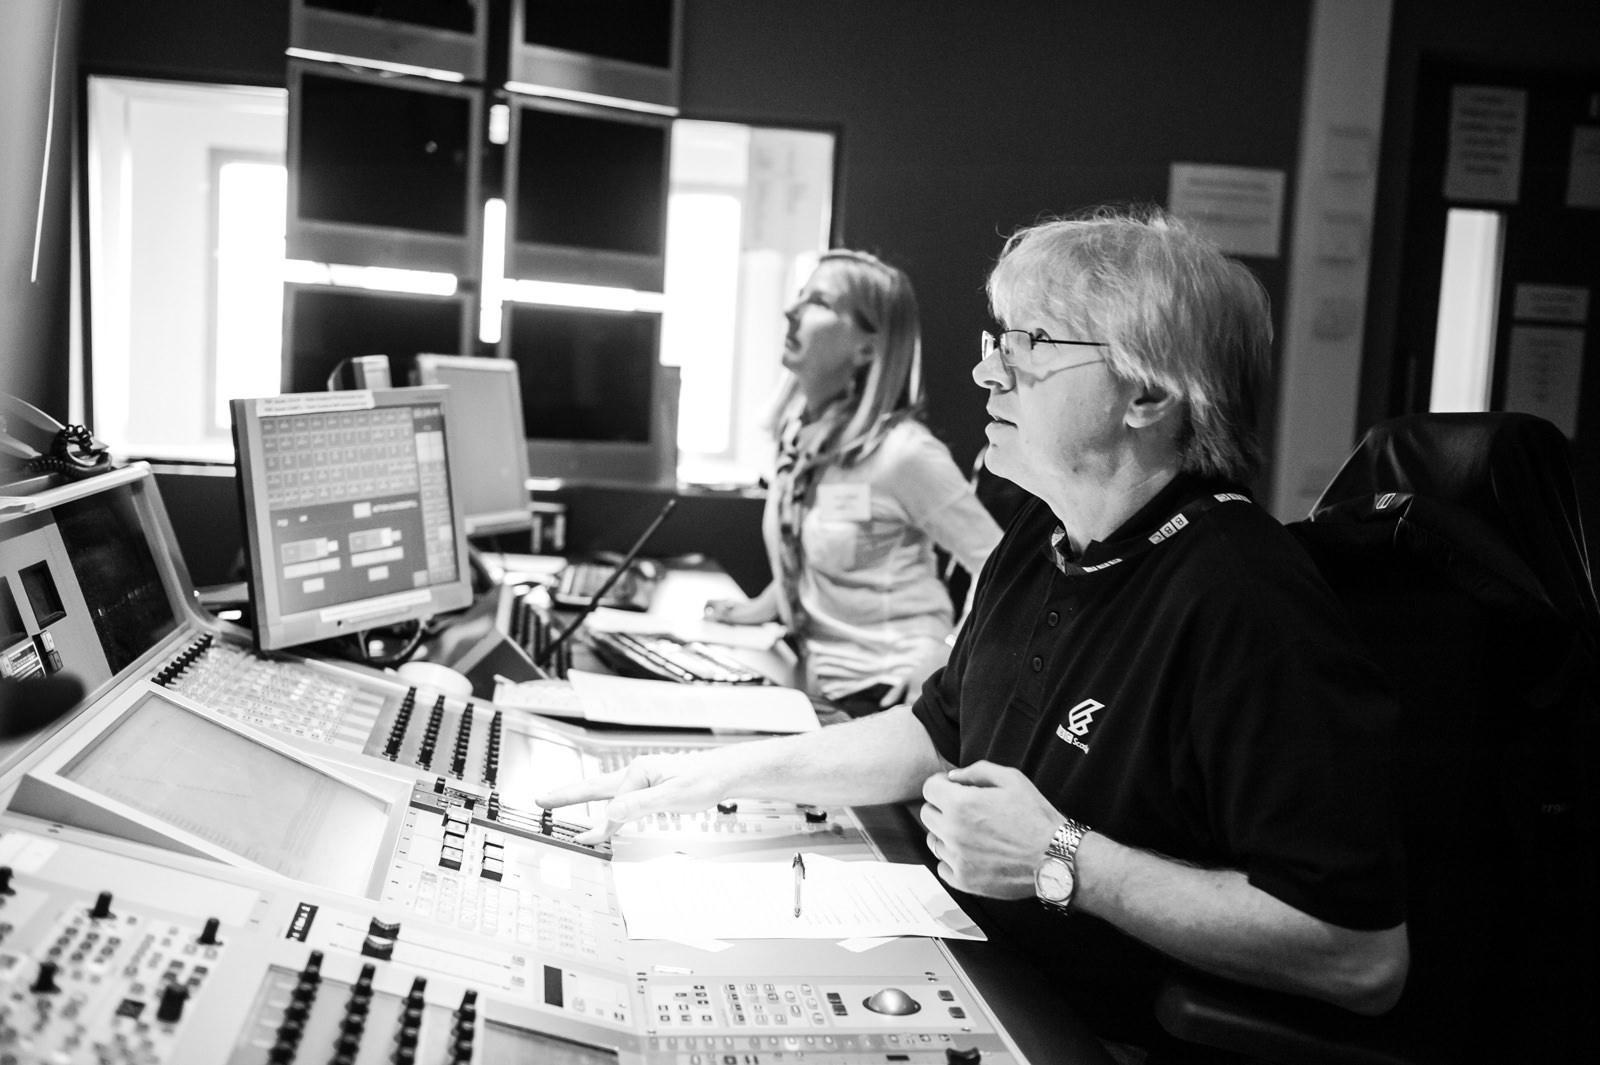 BBC Academy's 'Expert Women' event at BBC Scotland, Glasgow, 28th August 2013